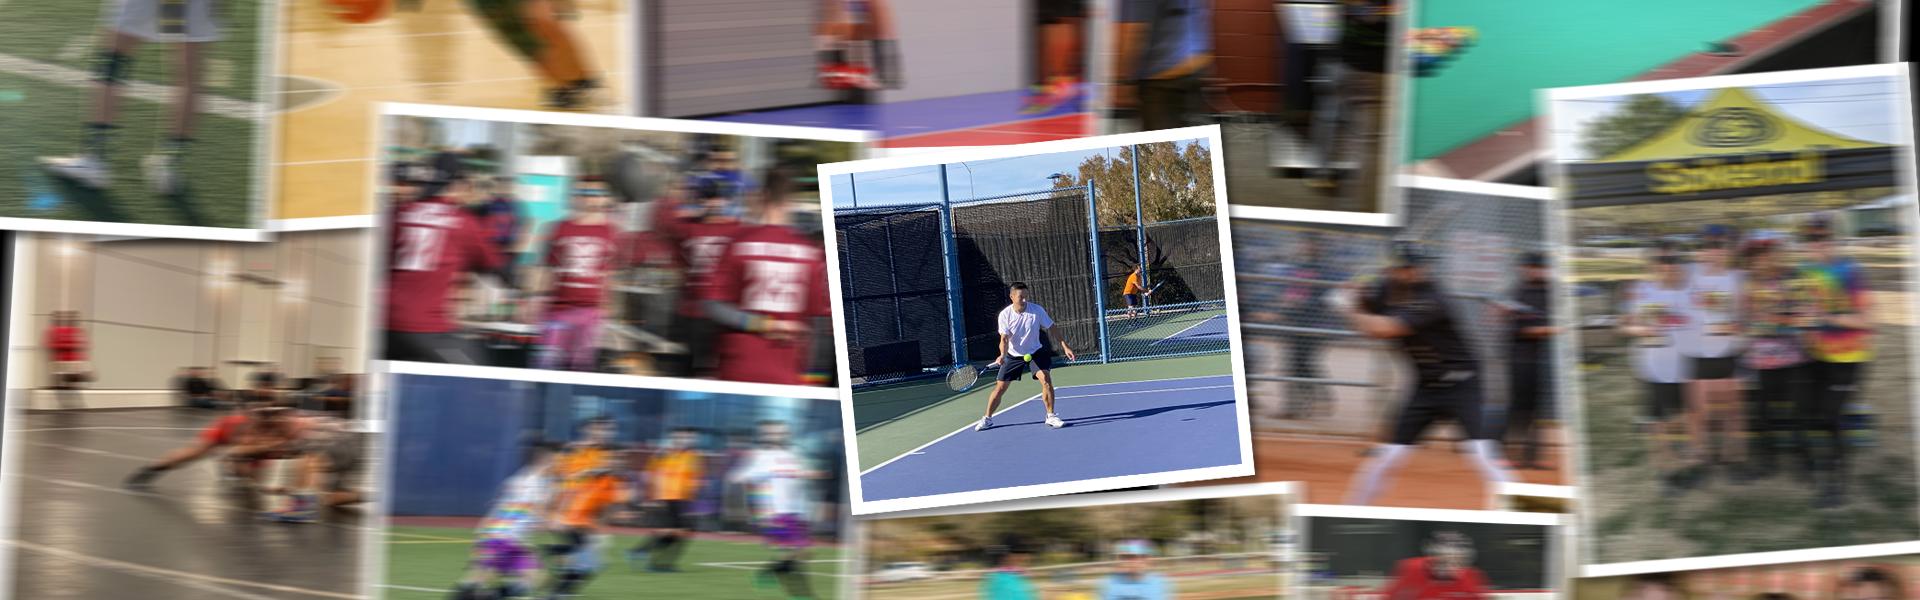 Tennis - 2022